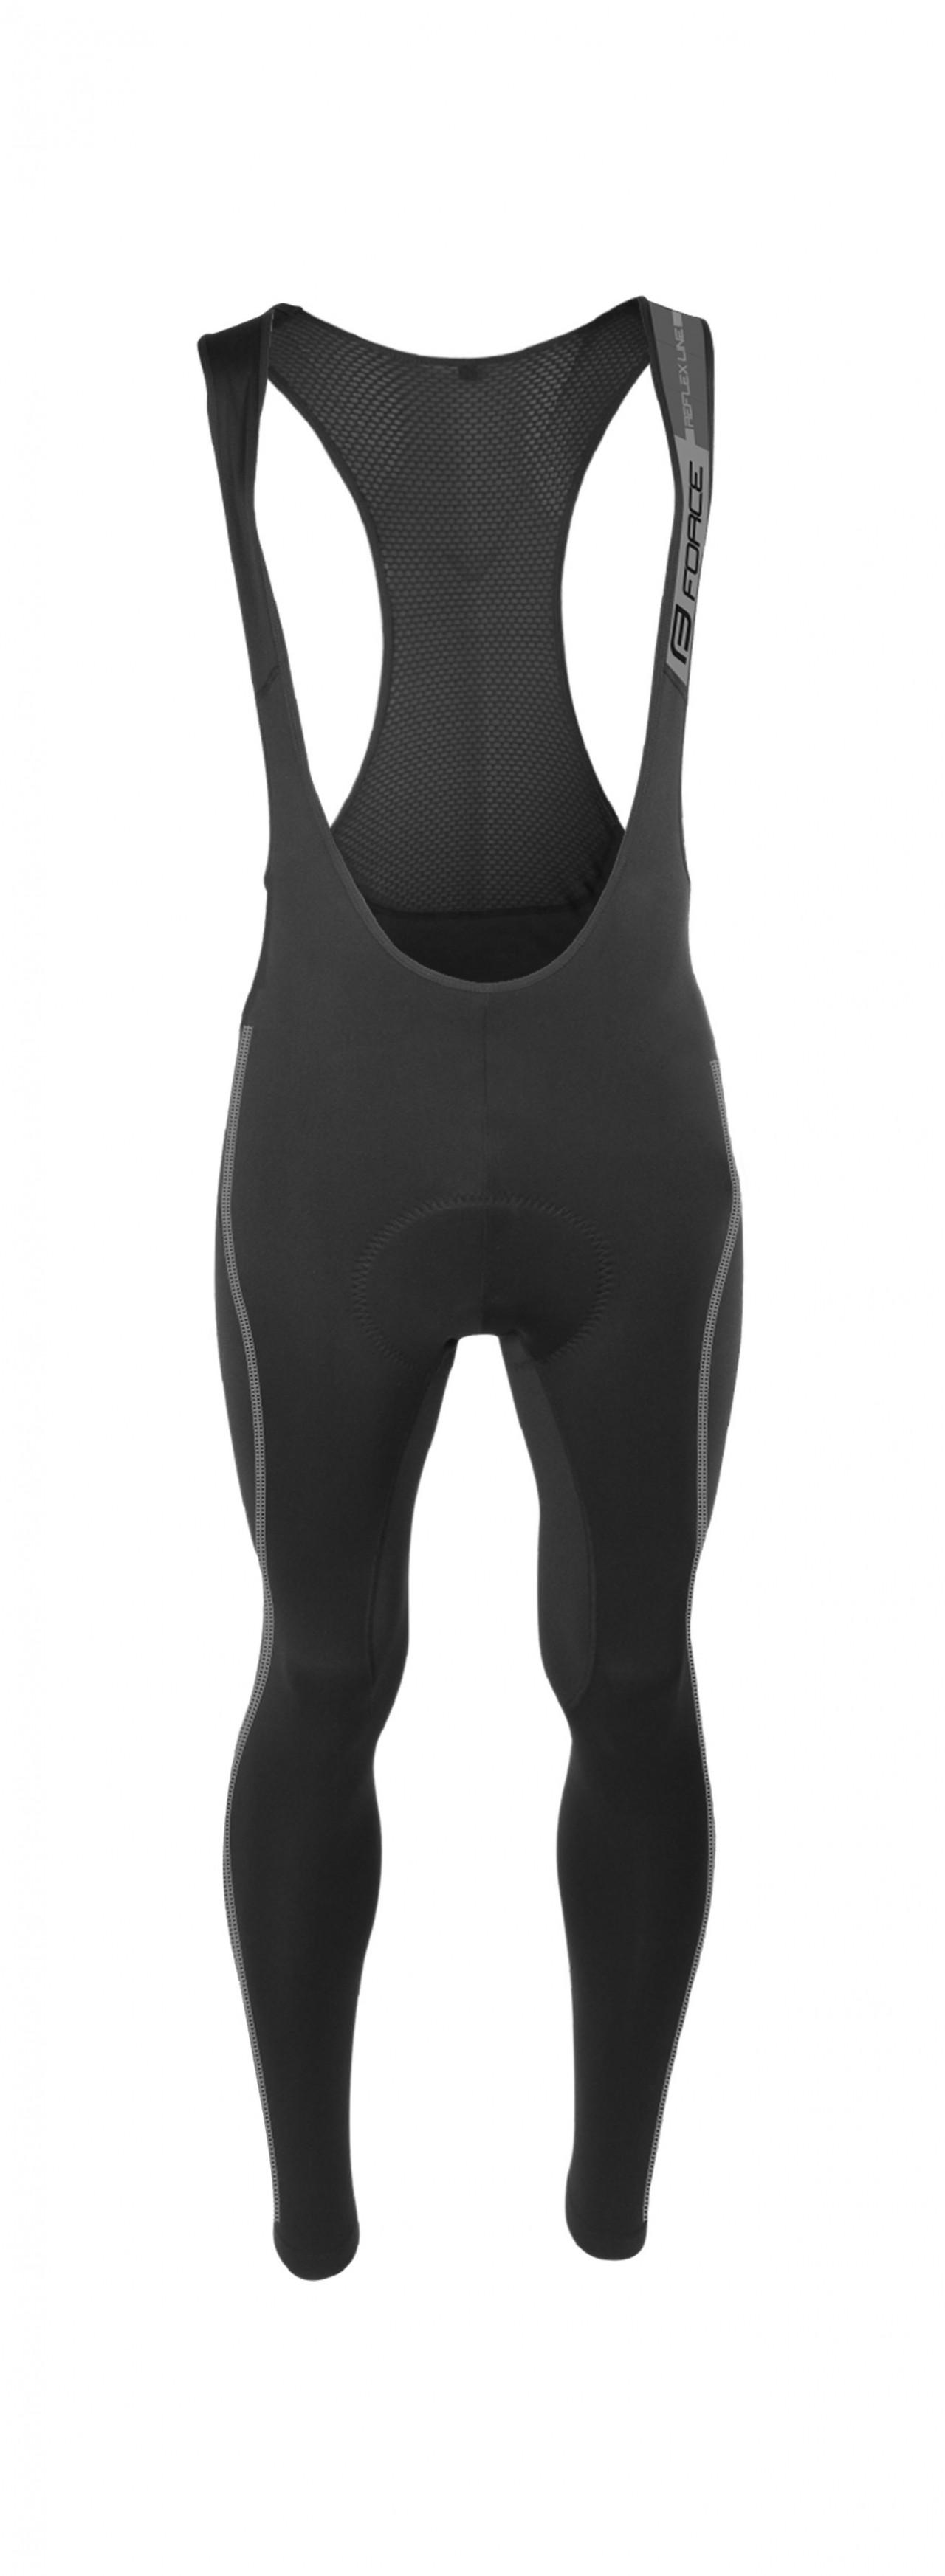 FORCE nohavice REFLEX LINE KID s vložkou, čierne 128-140